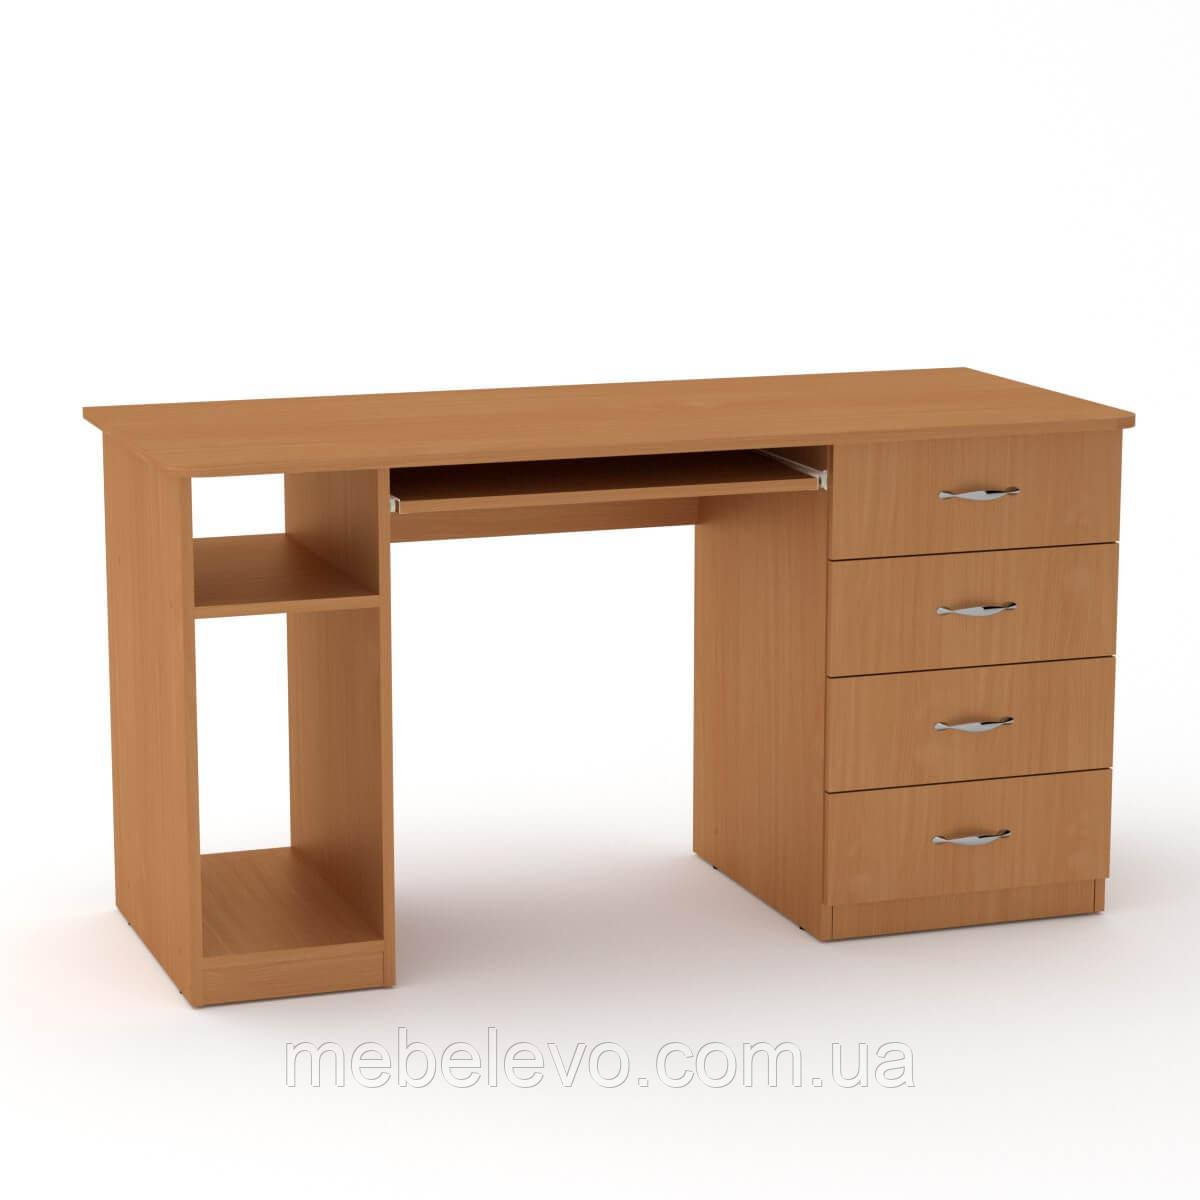 Стол компьютерный СКМ-11 736х1400х600мм    Компанит